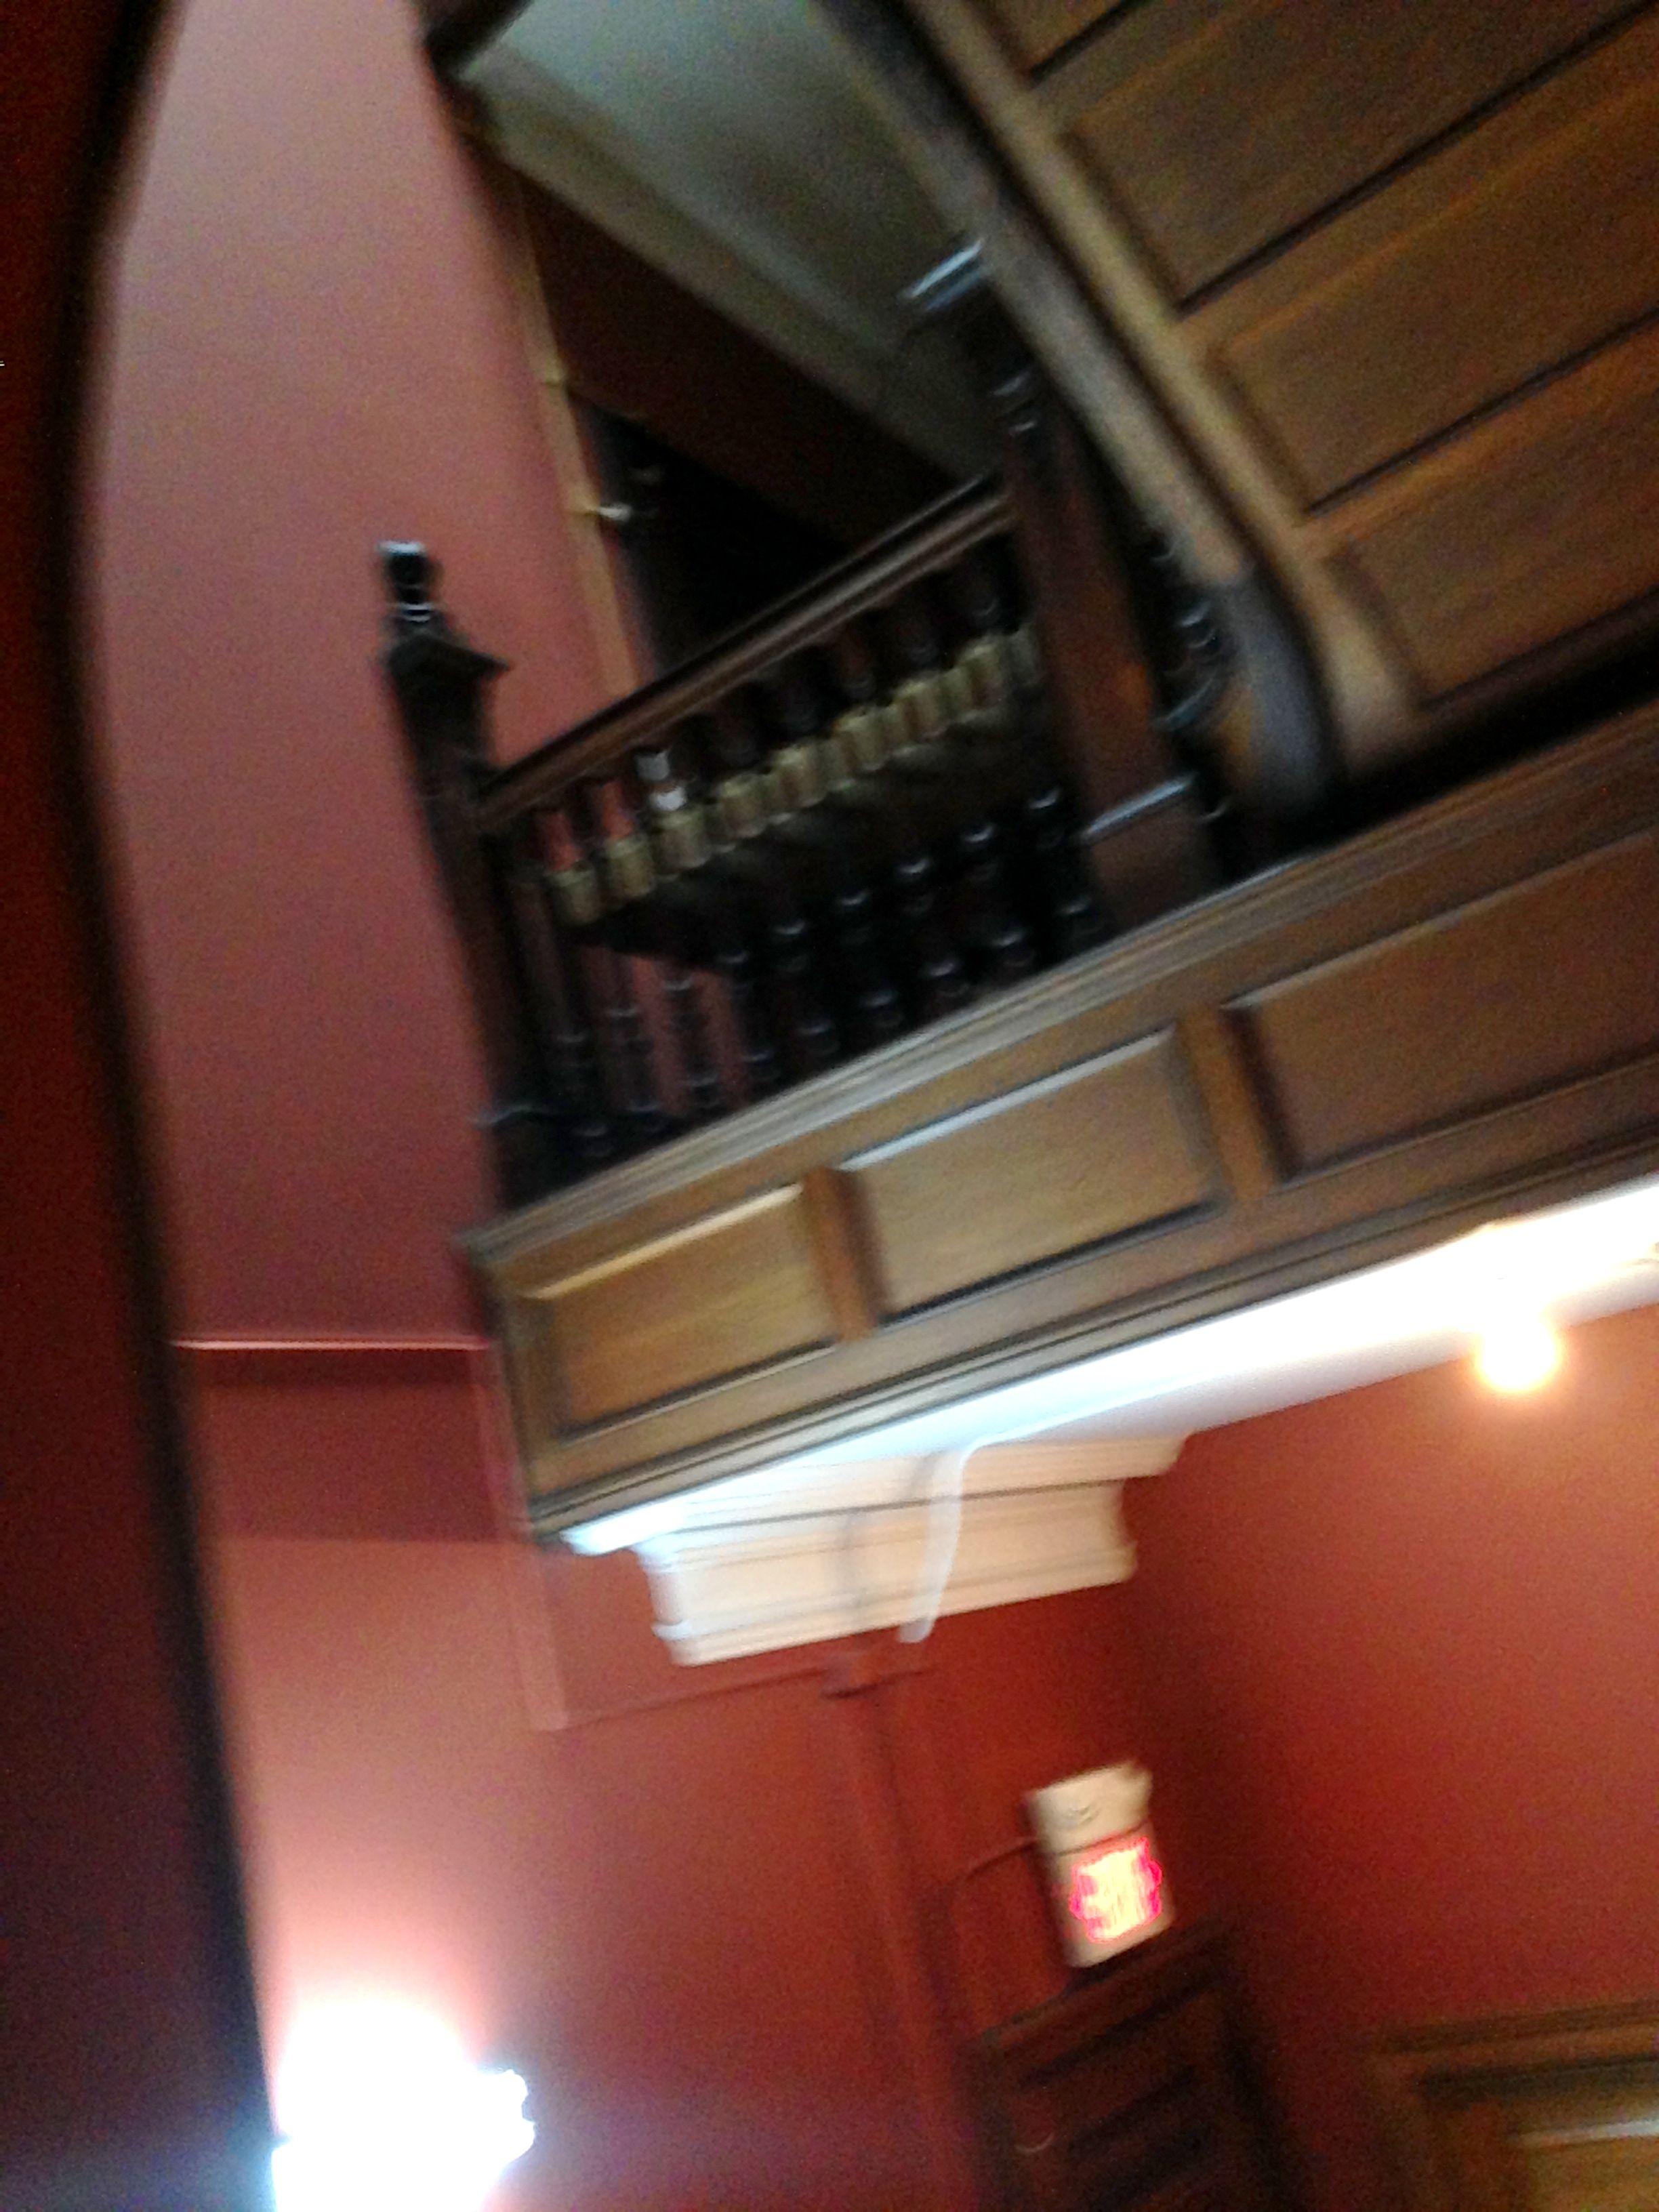 Pin By Dena Walley On Biltmore Estate 2nd Floor Biltmore House Rose Bedroom Biltmore Estate